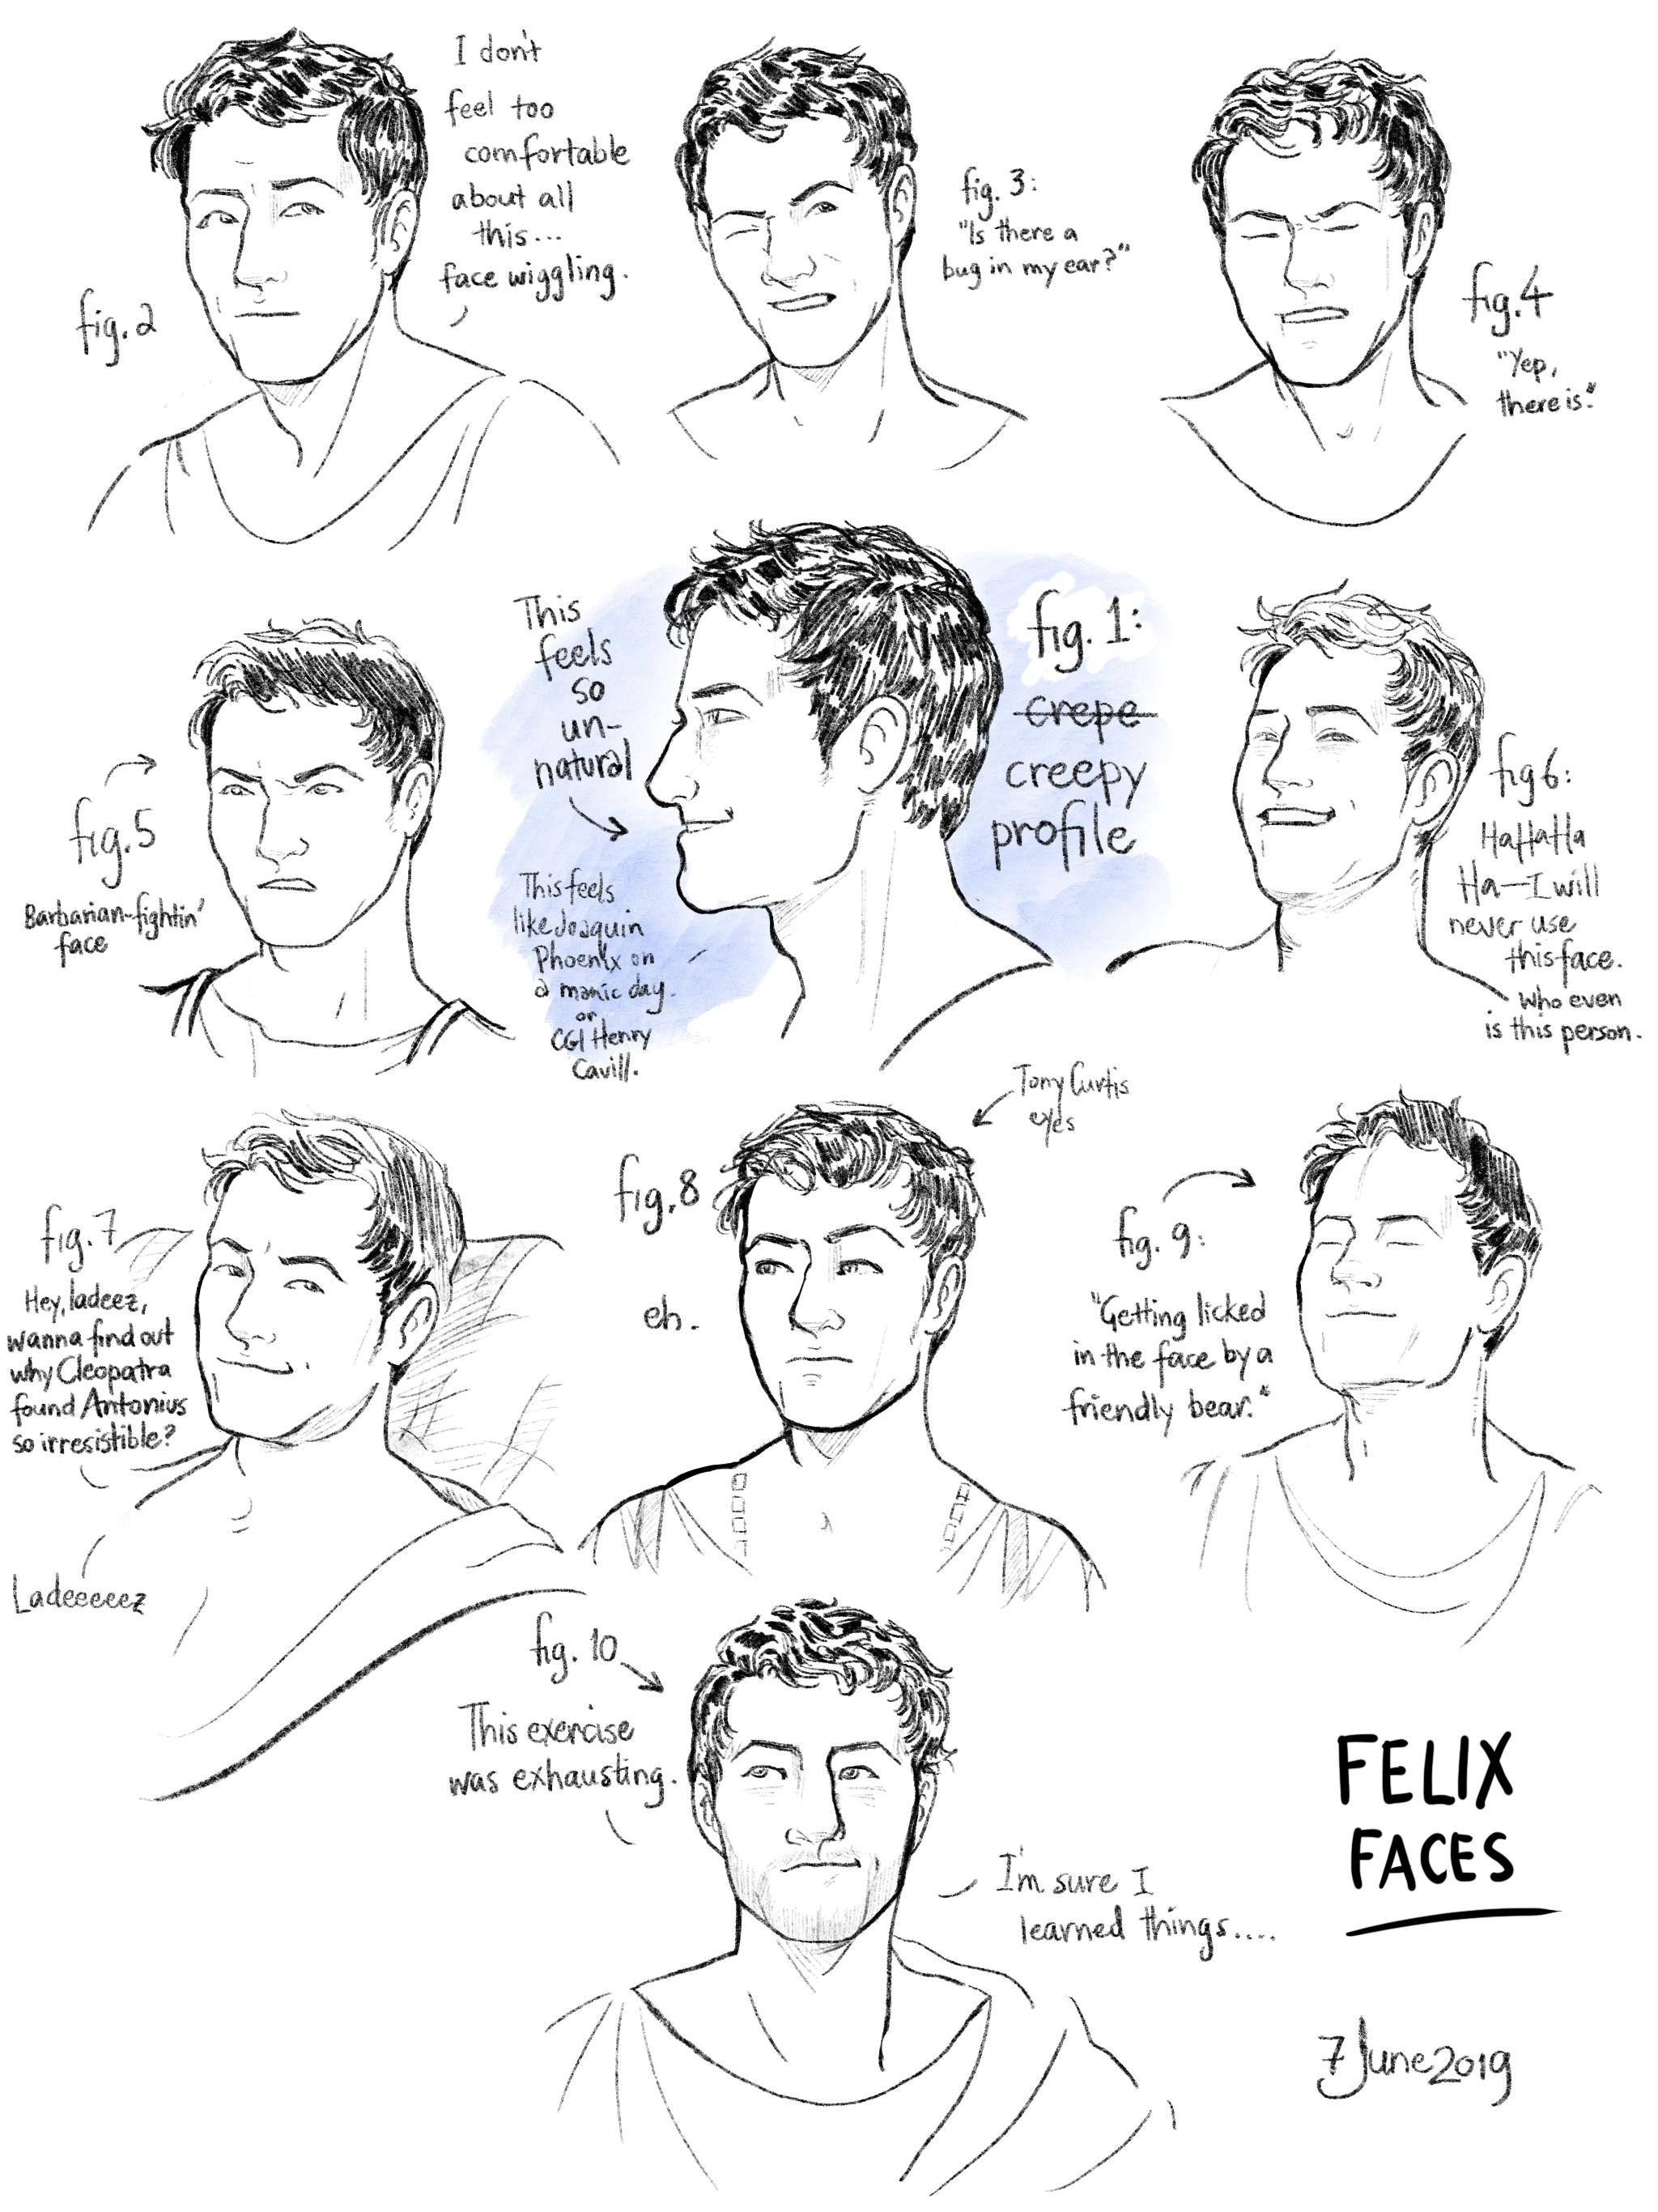 Head studies 4: Felix faces